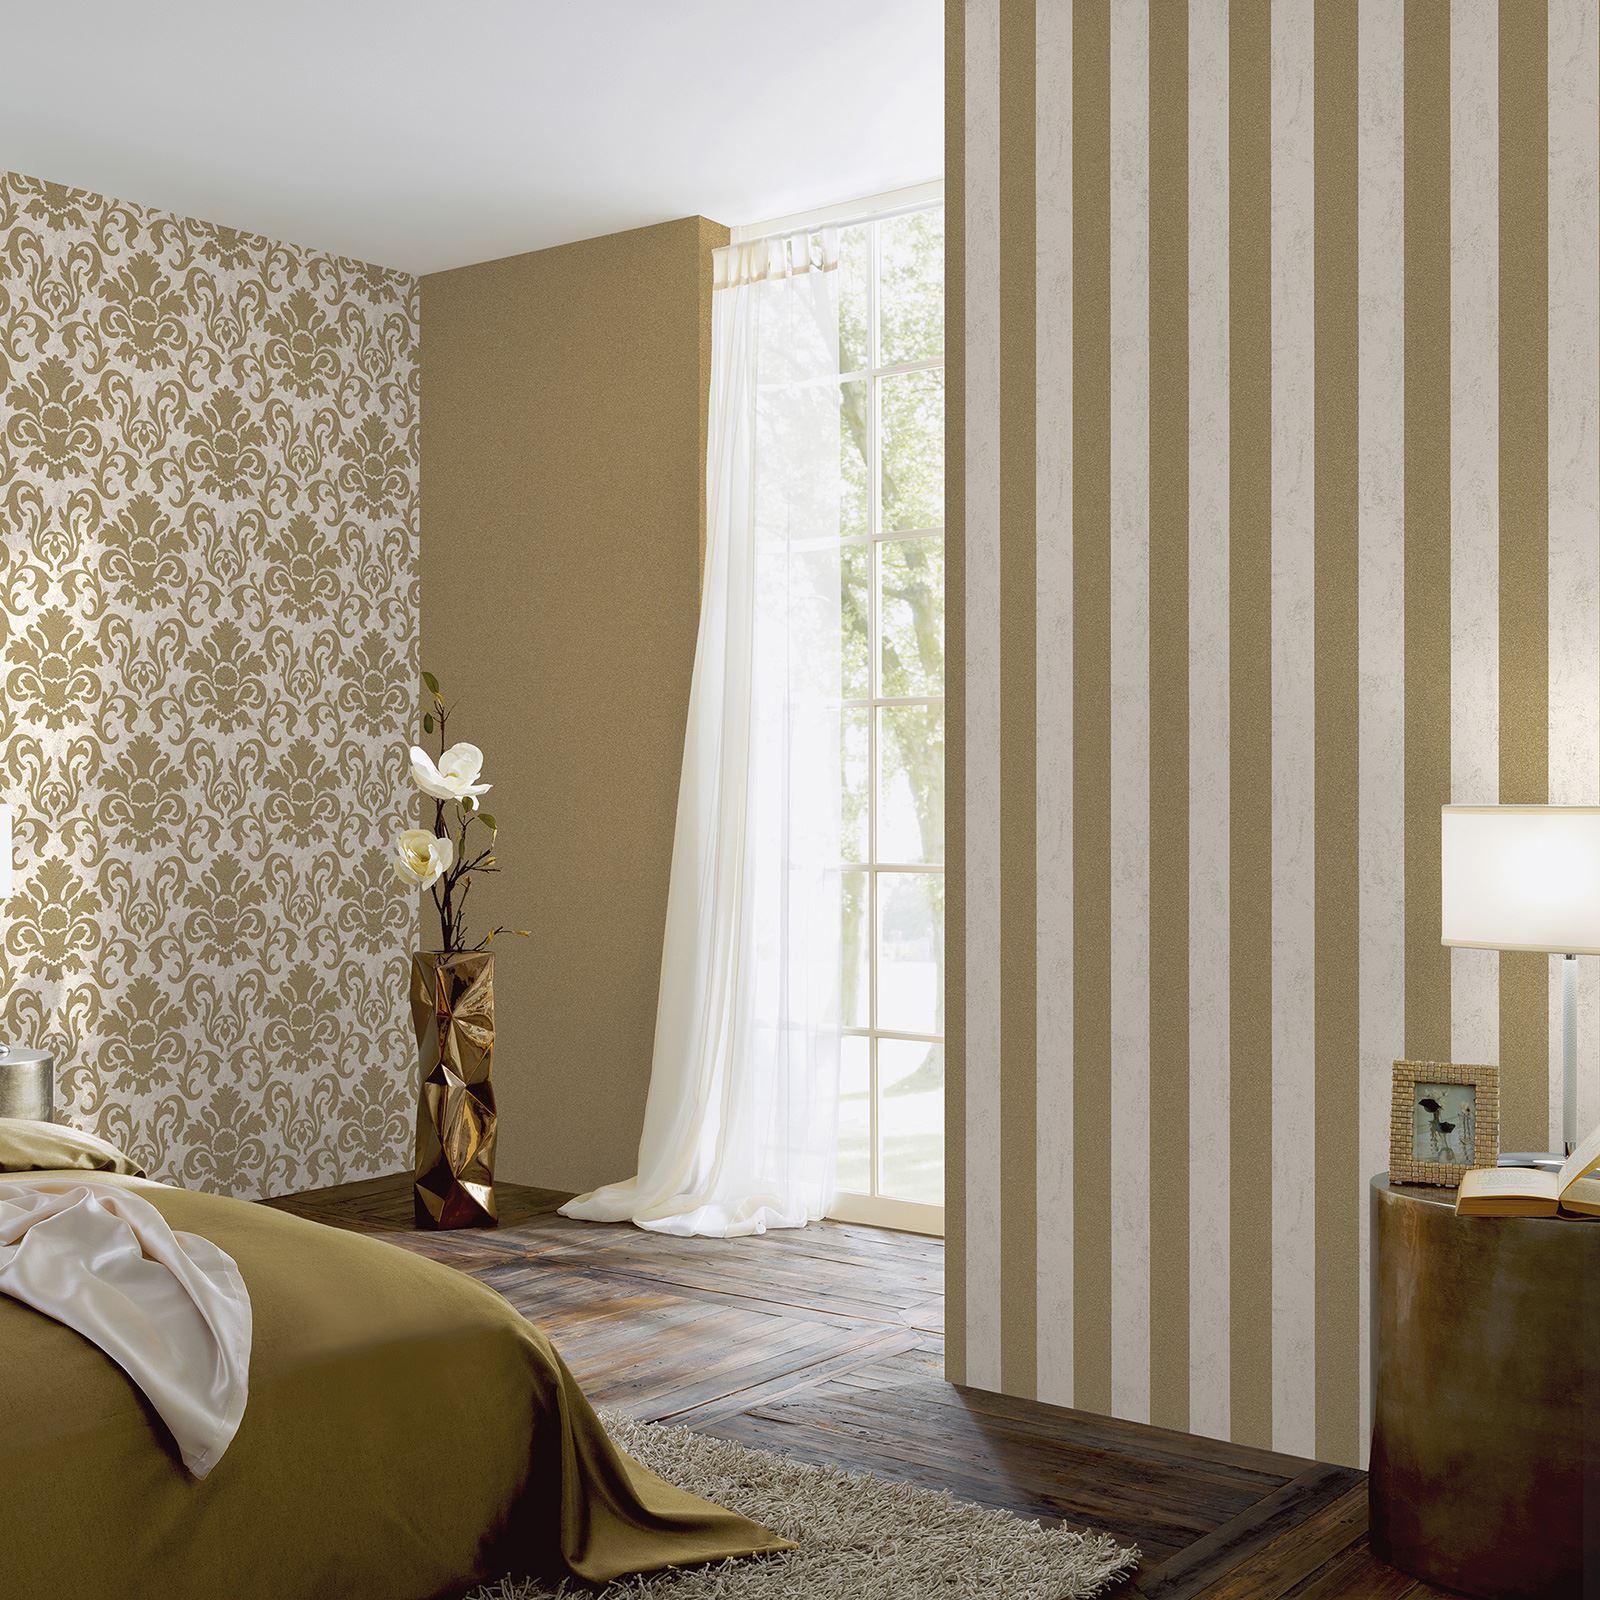 P s carat glitter stripe wallpaper black cream silver gold for Black feature wall bedroom